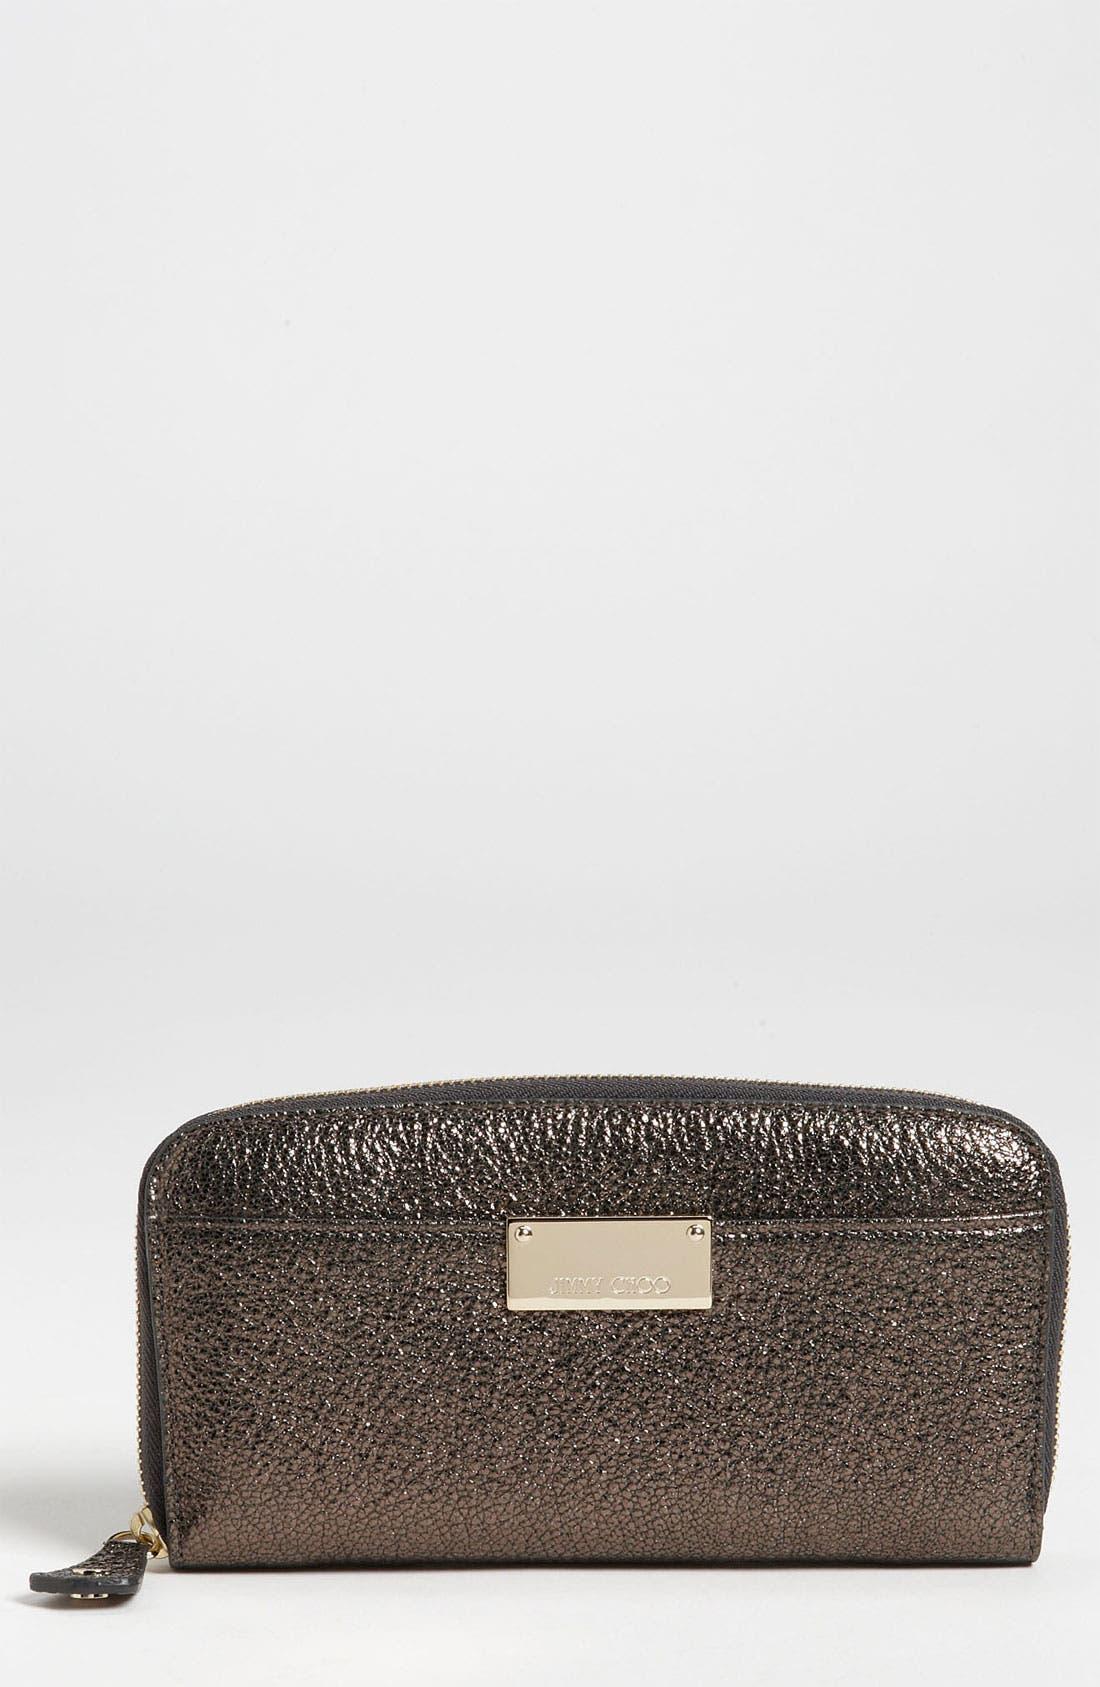 Main Image - Jimmy Choo 'Rush' Glitter Leather Wallet